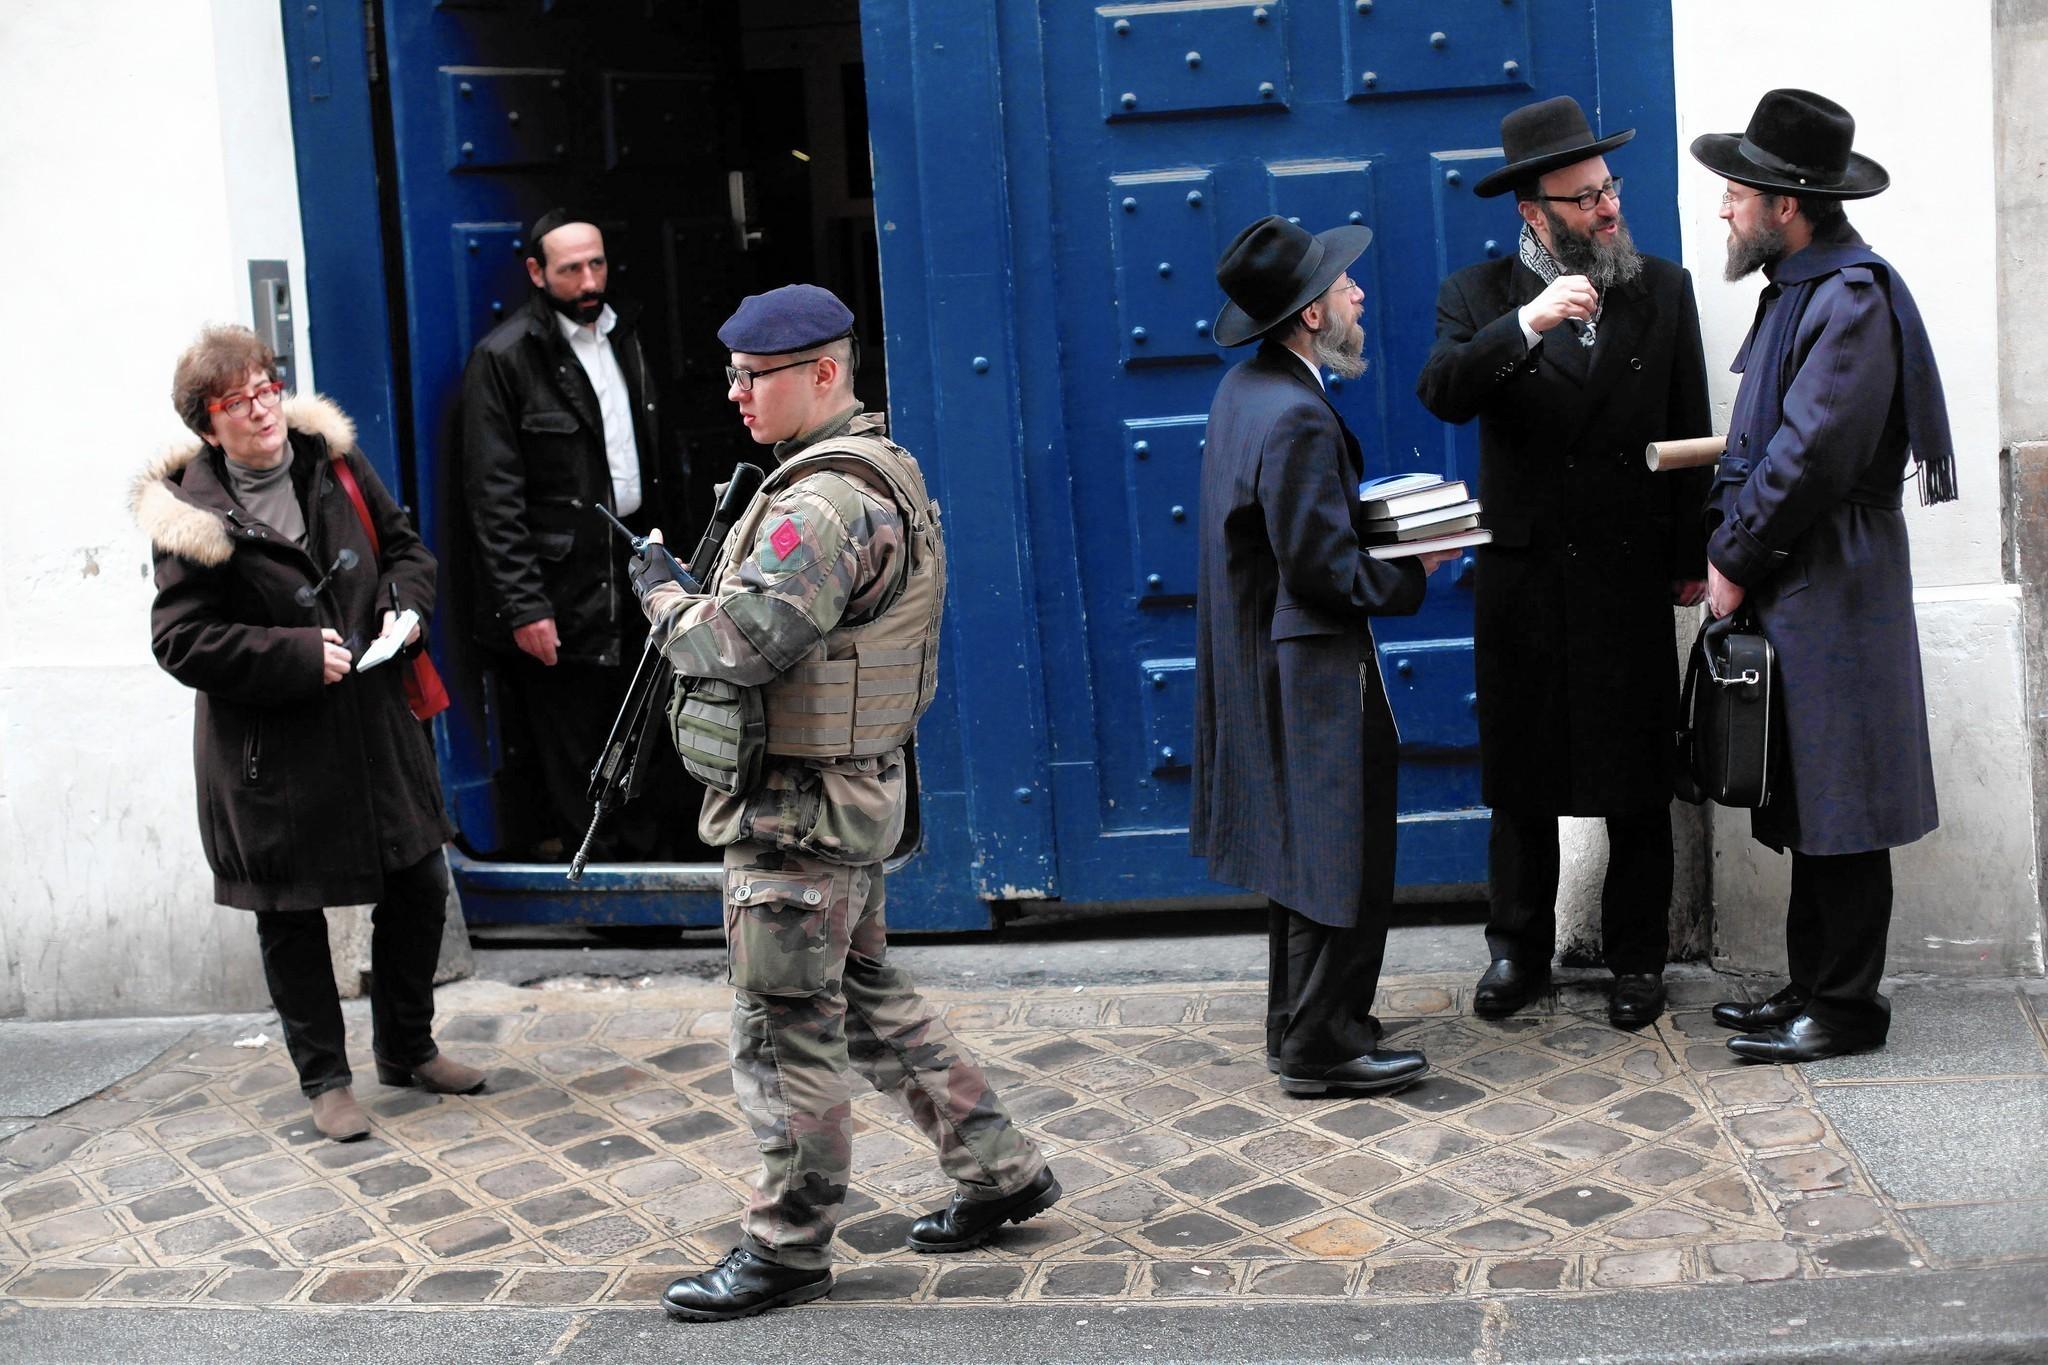 la france jewish singles Jewish toronto calendar suggest an event print day week month search & filter jul 2018  reg 108155797rr0002 united jewish appeal of greater toronto, reg.